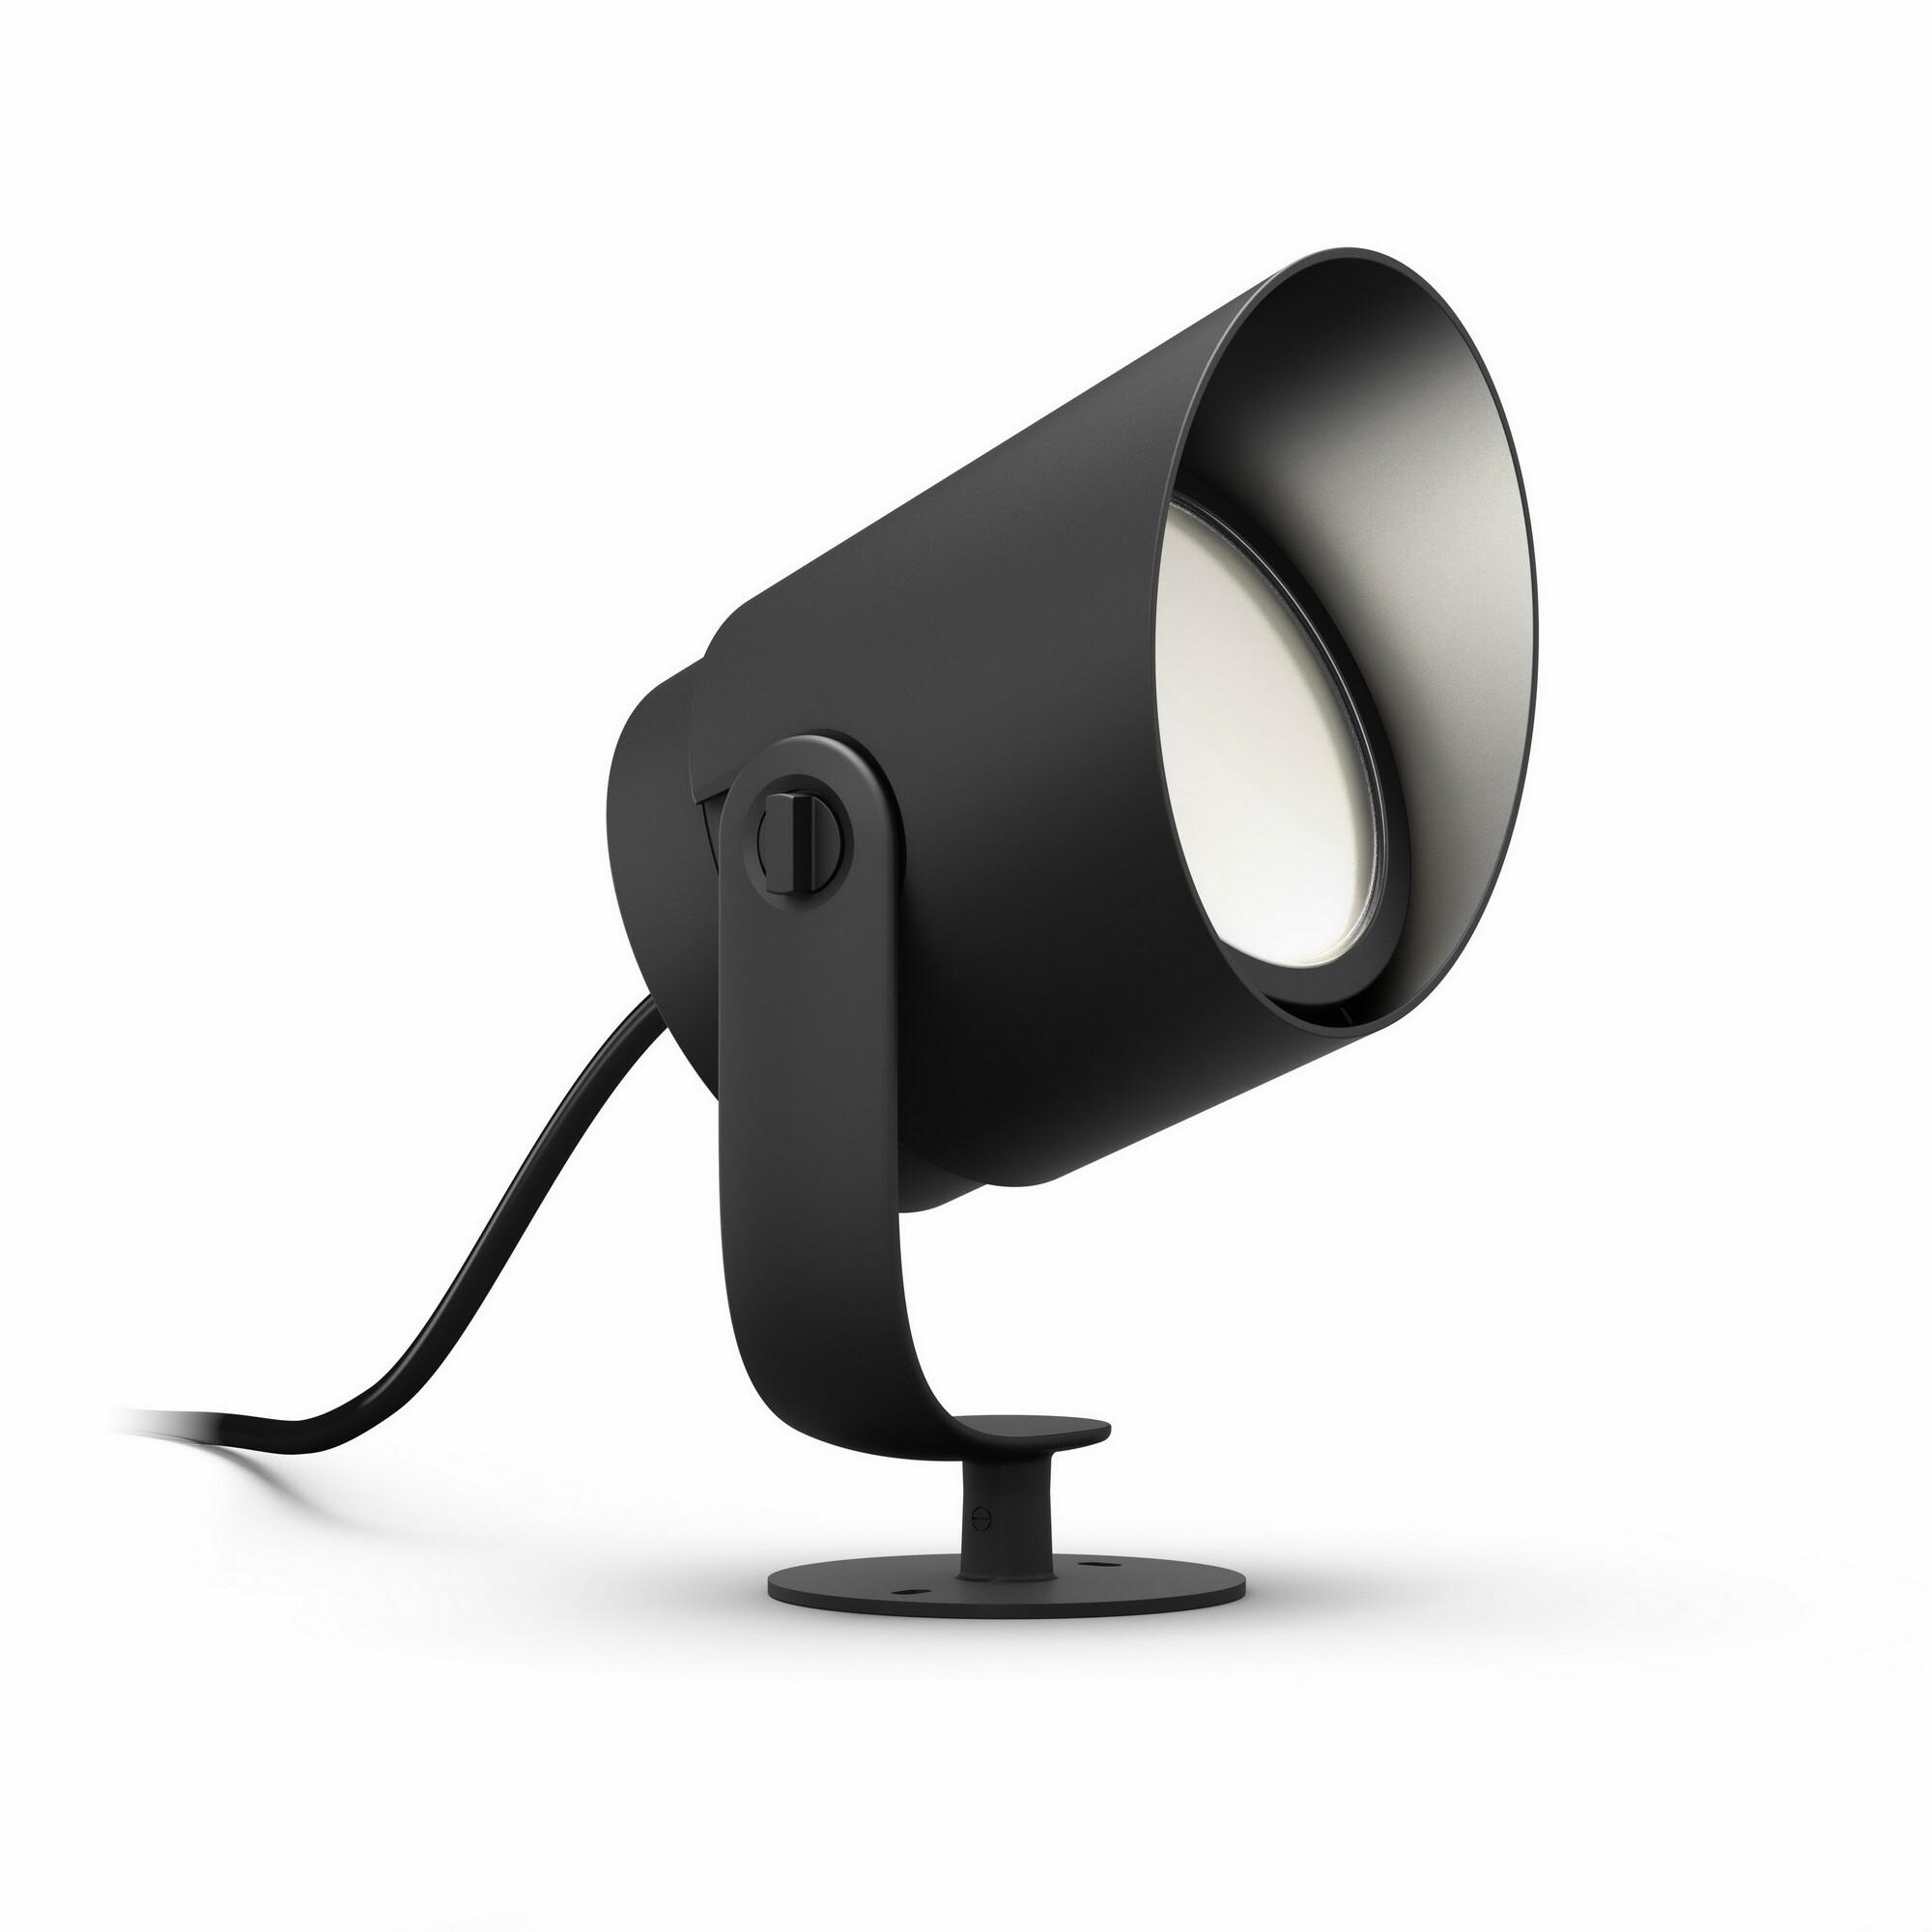 Philips HUE LILY Grondspot LED 1x15W/1050lm Zwart